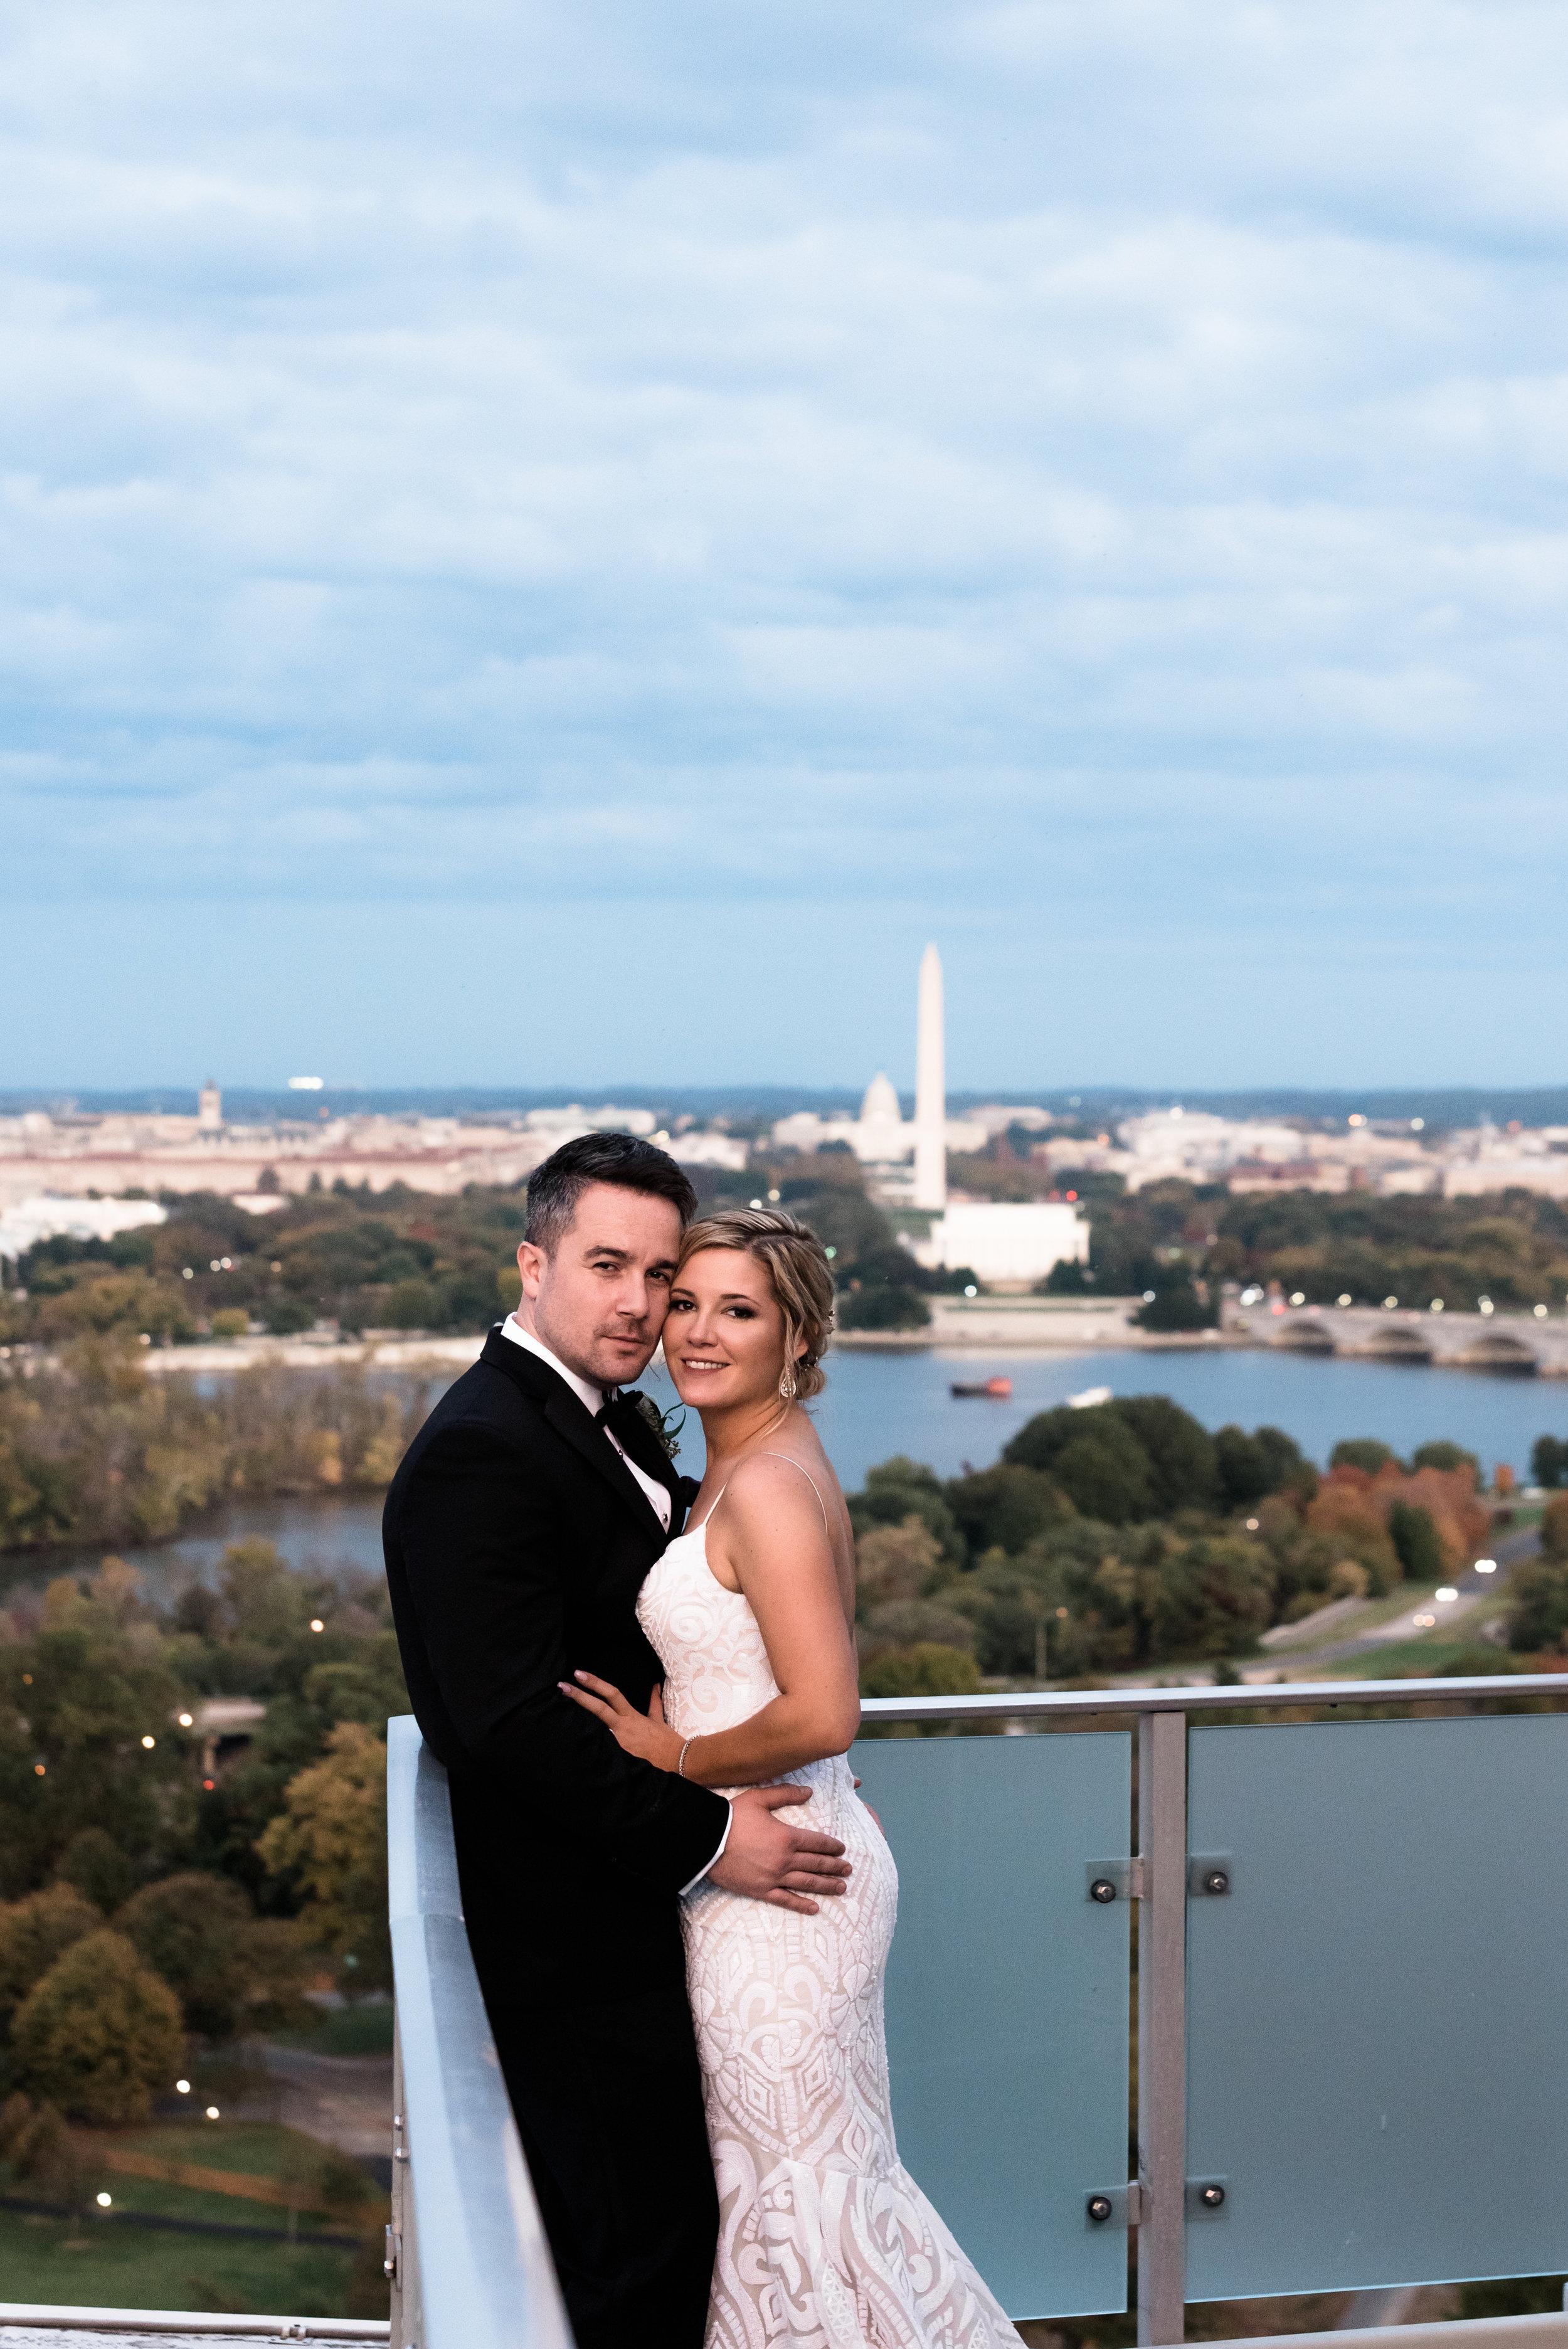 DavidAmandaMundy-Wedding-10282017-KathrynIvyPhotography-410.jpg